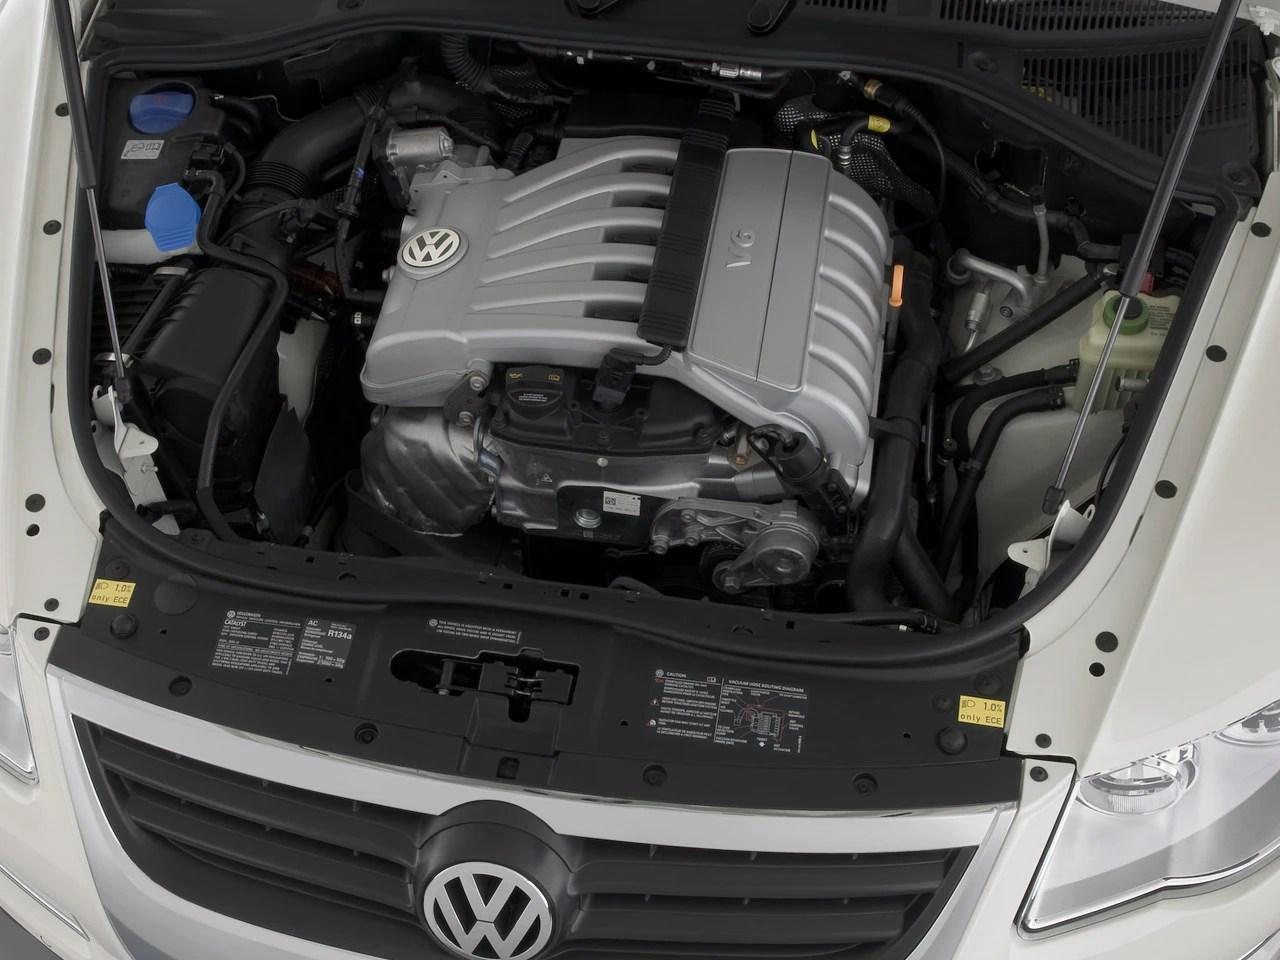 1996 Jetta Vr6 Engine Diagram 2008 Volkswagen Touareg 2 Reviews Research Touareg 2